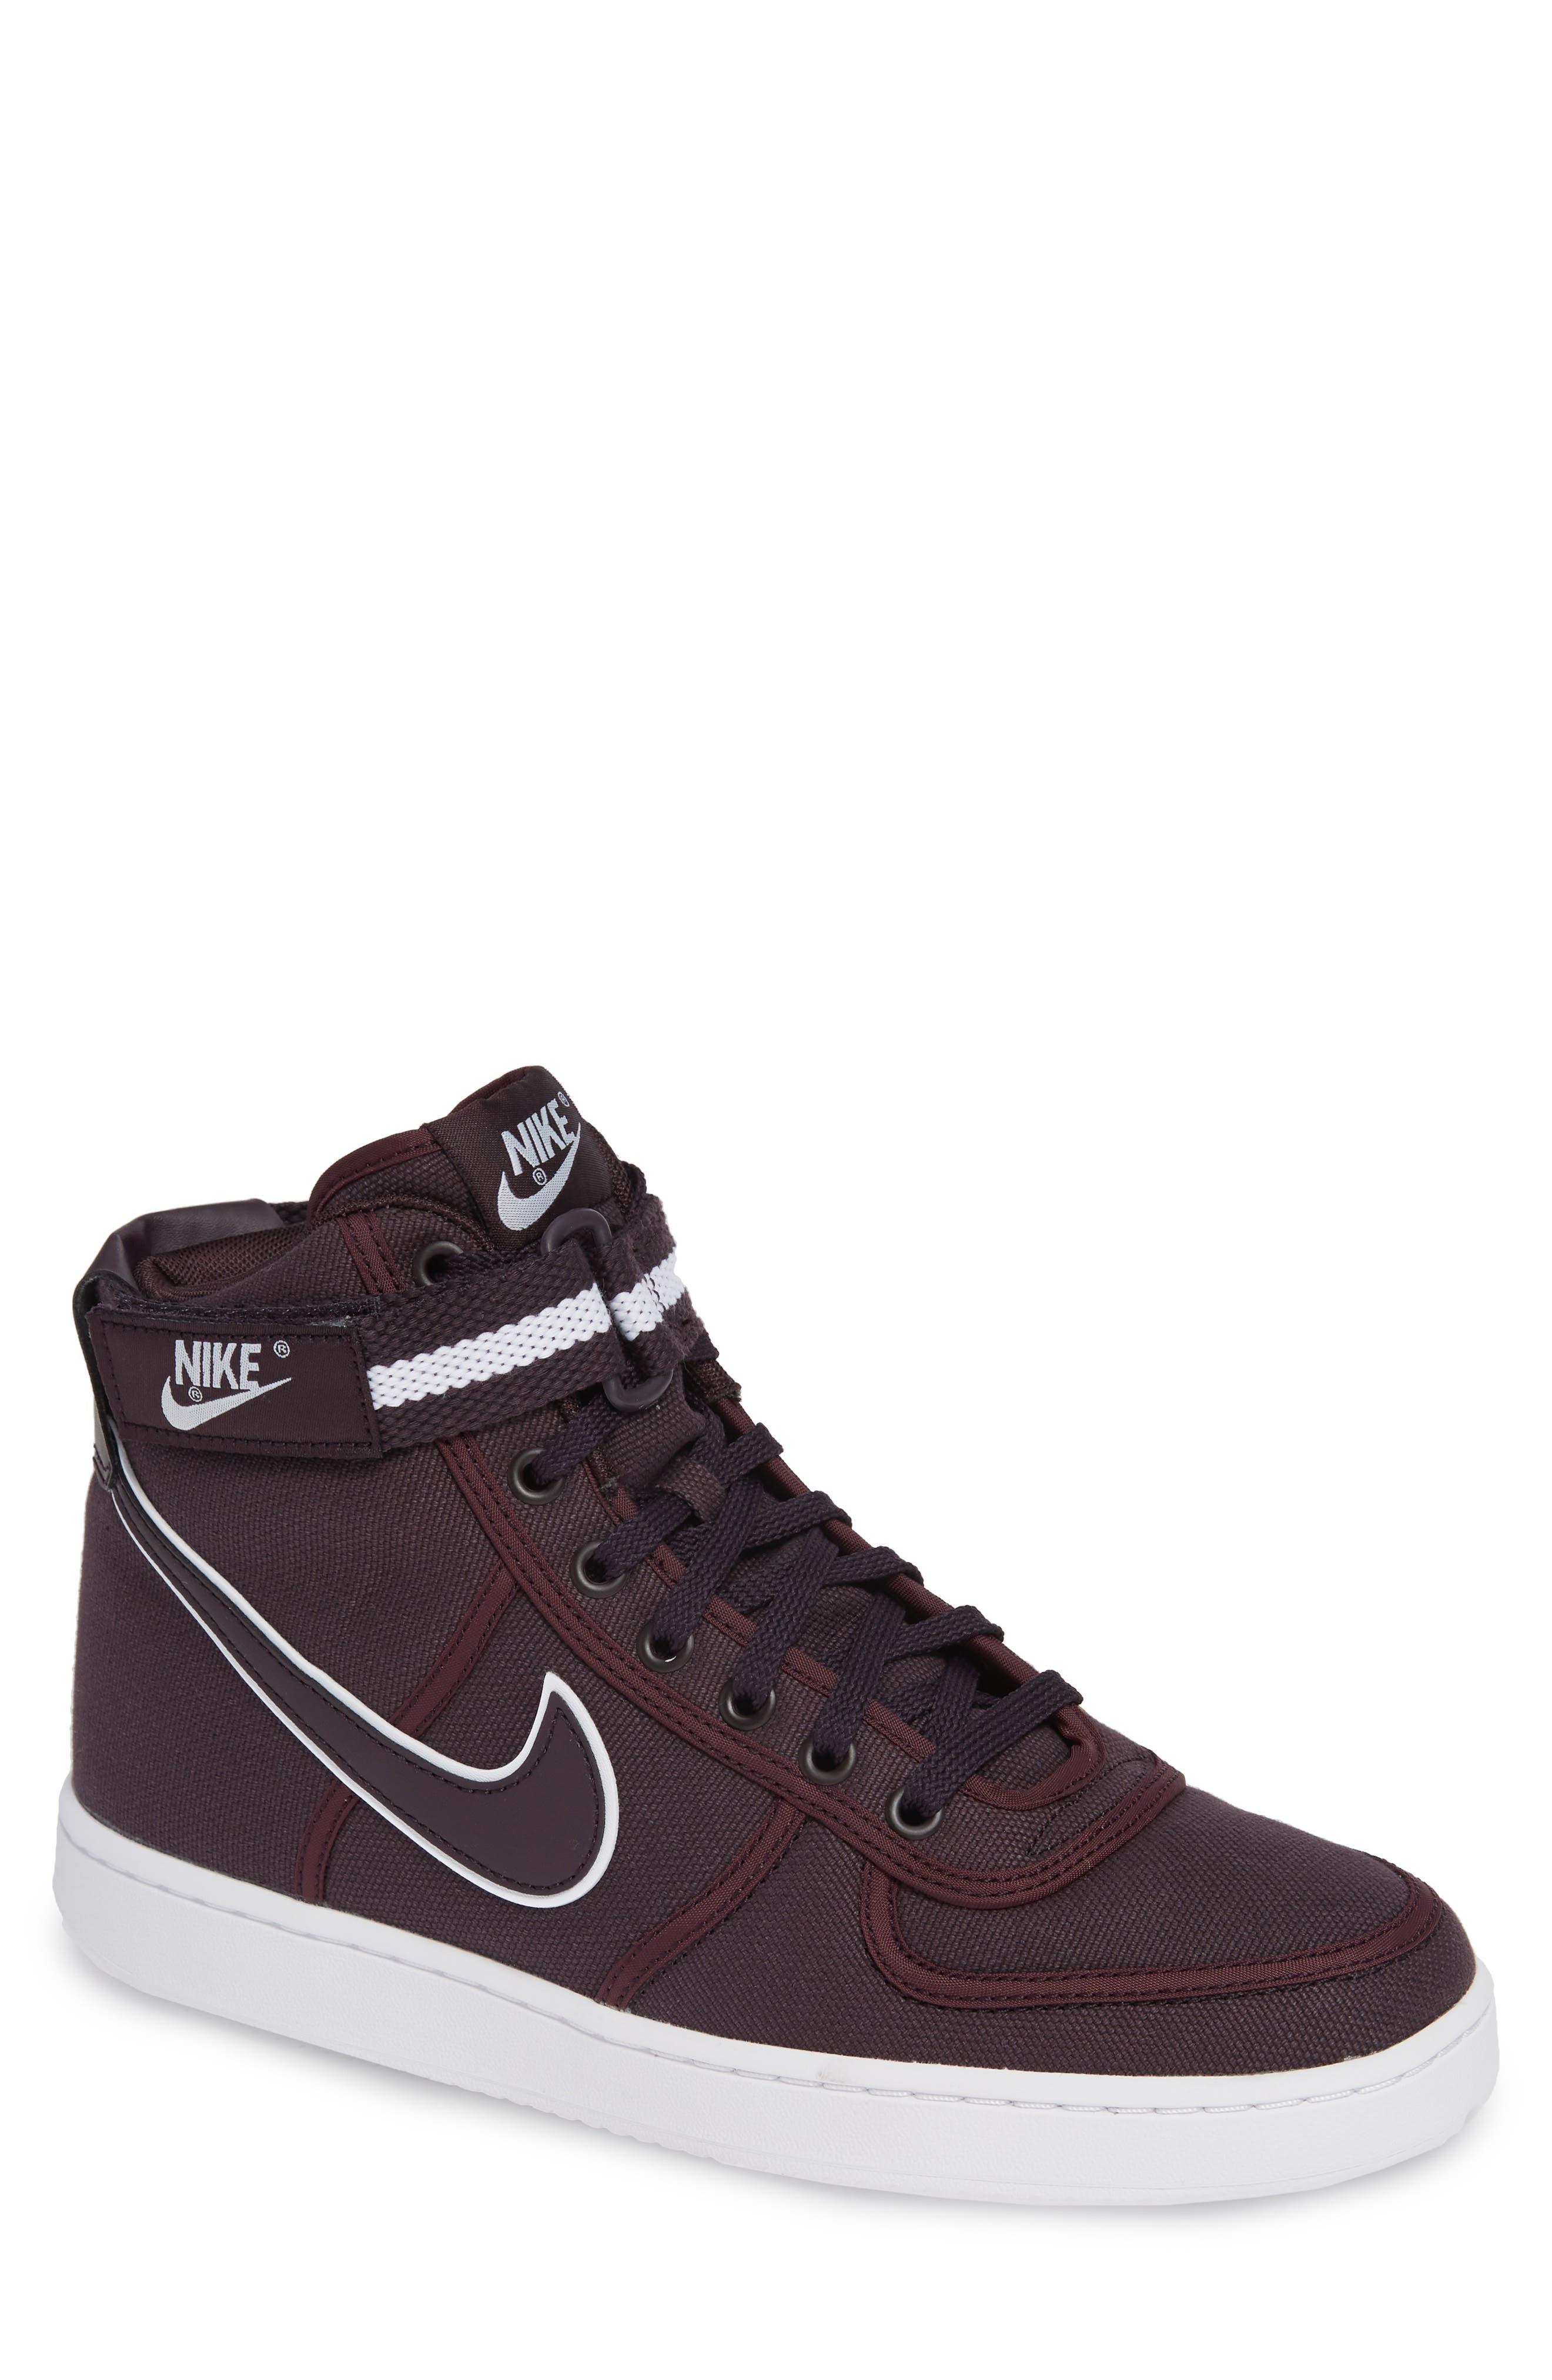 Vandal High Supreme High Top Sneaker,                         Main,                         color, Burgundy Ash/ White